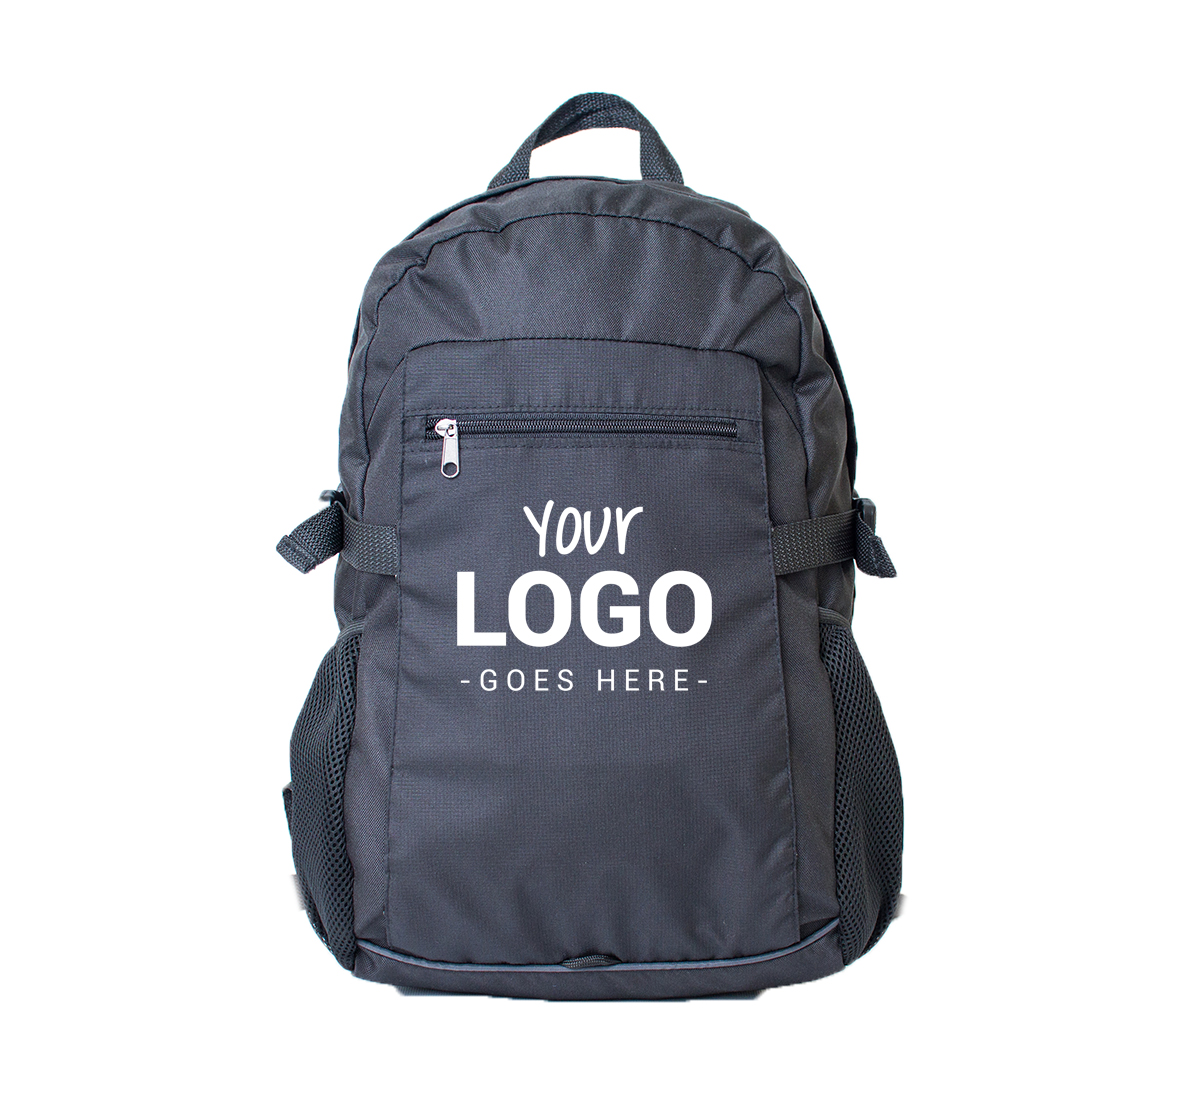 пошив рюкзаков, пошив рюкзаков на заказ, пошив сумок и рюкзаков, печать на рюкзаках, рюкзаки на заказ